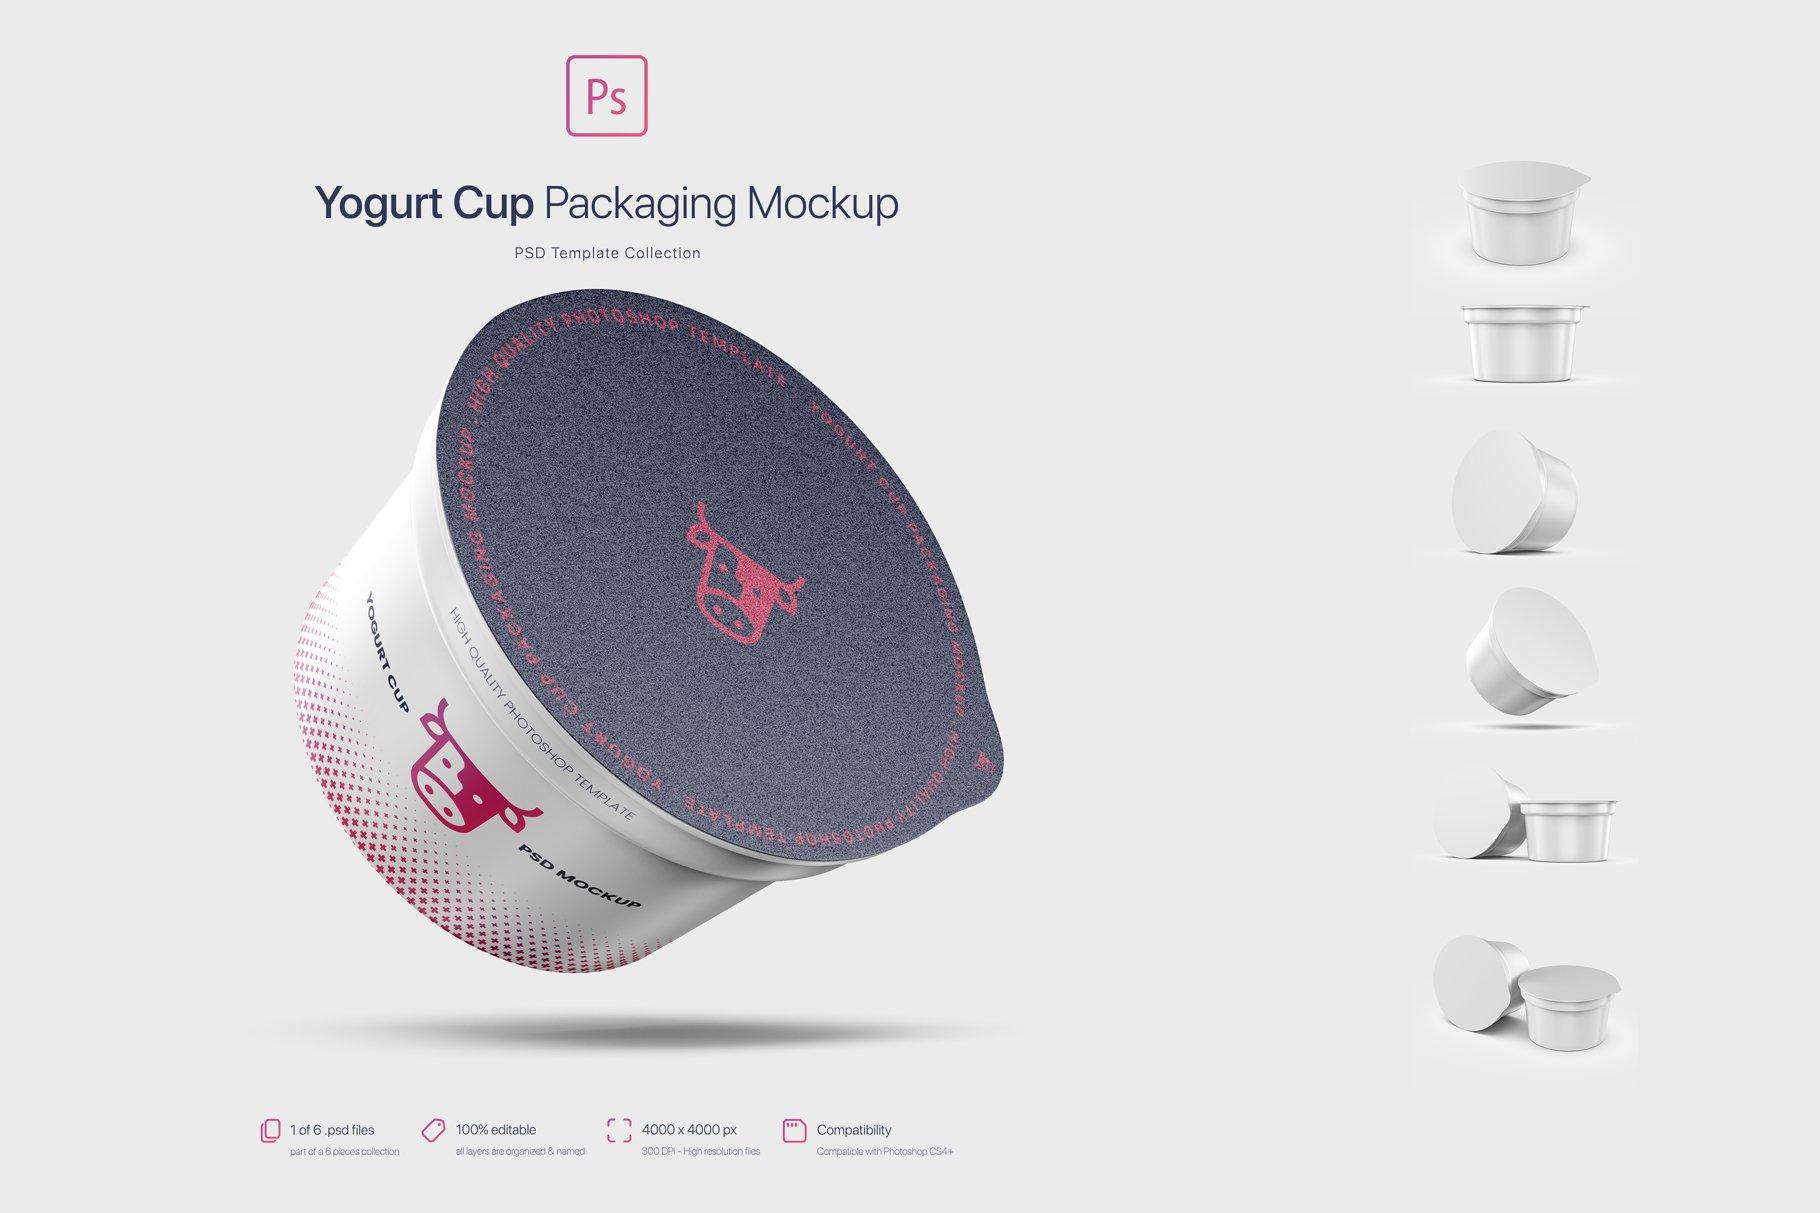 6款逼真高质量酸奶杯设计展示样机 Yogurt Cup Packaging Mockup插图2